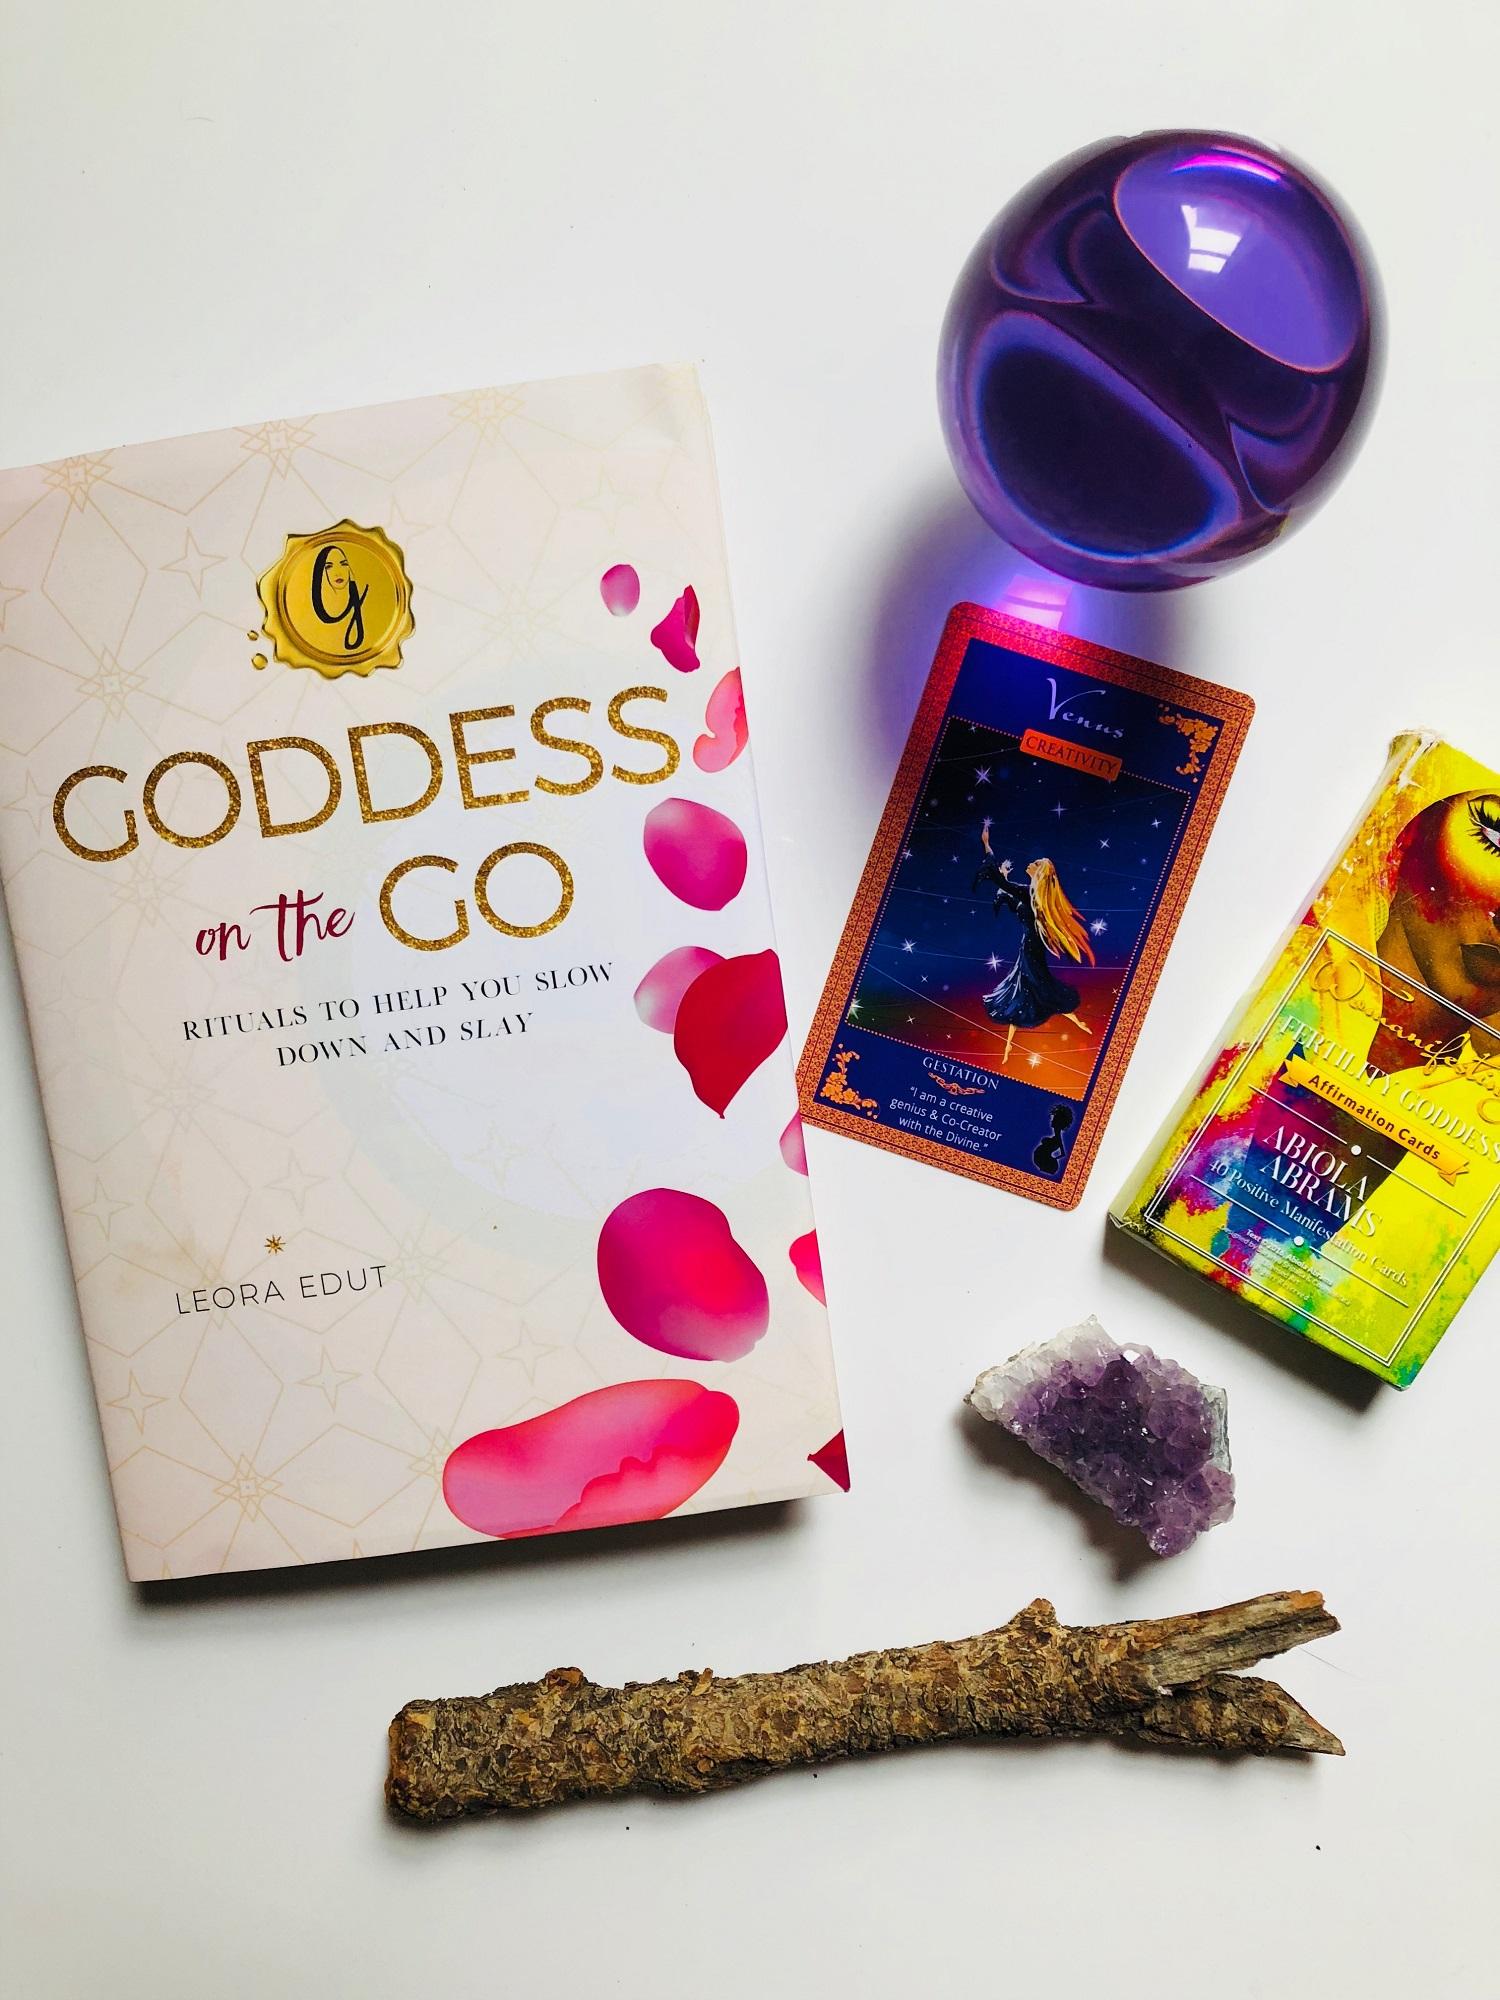 Goddess on the Go by Leora Edut